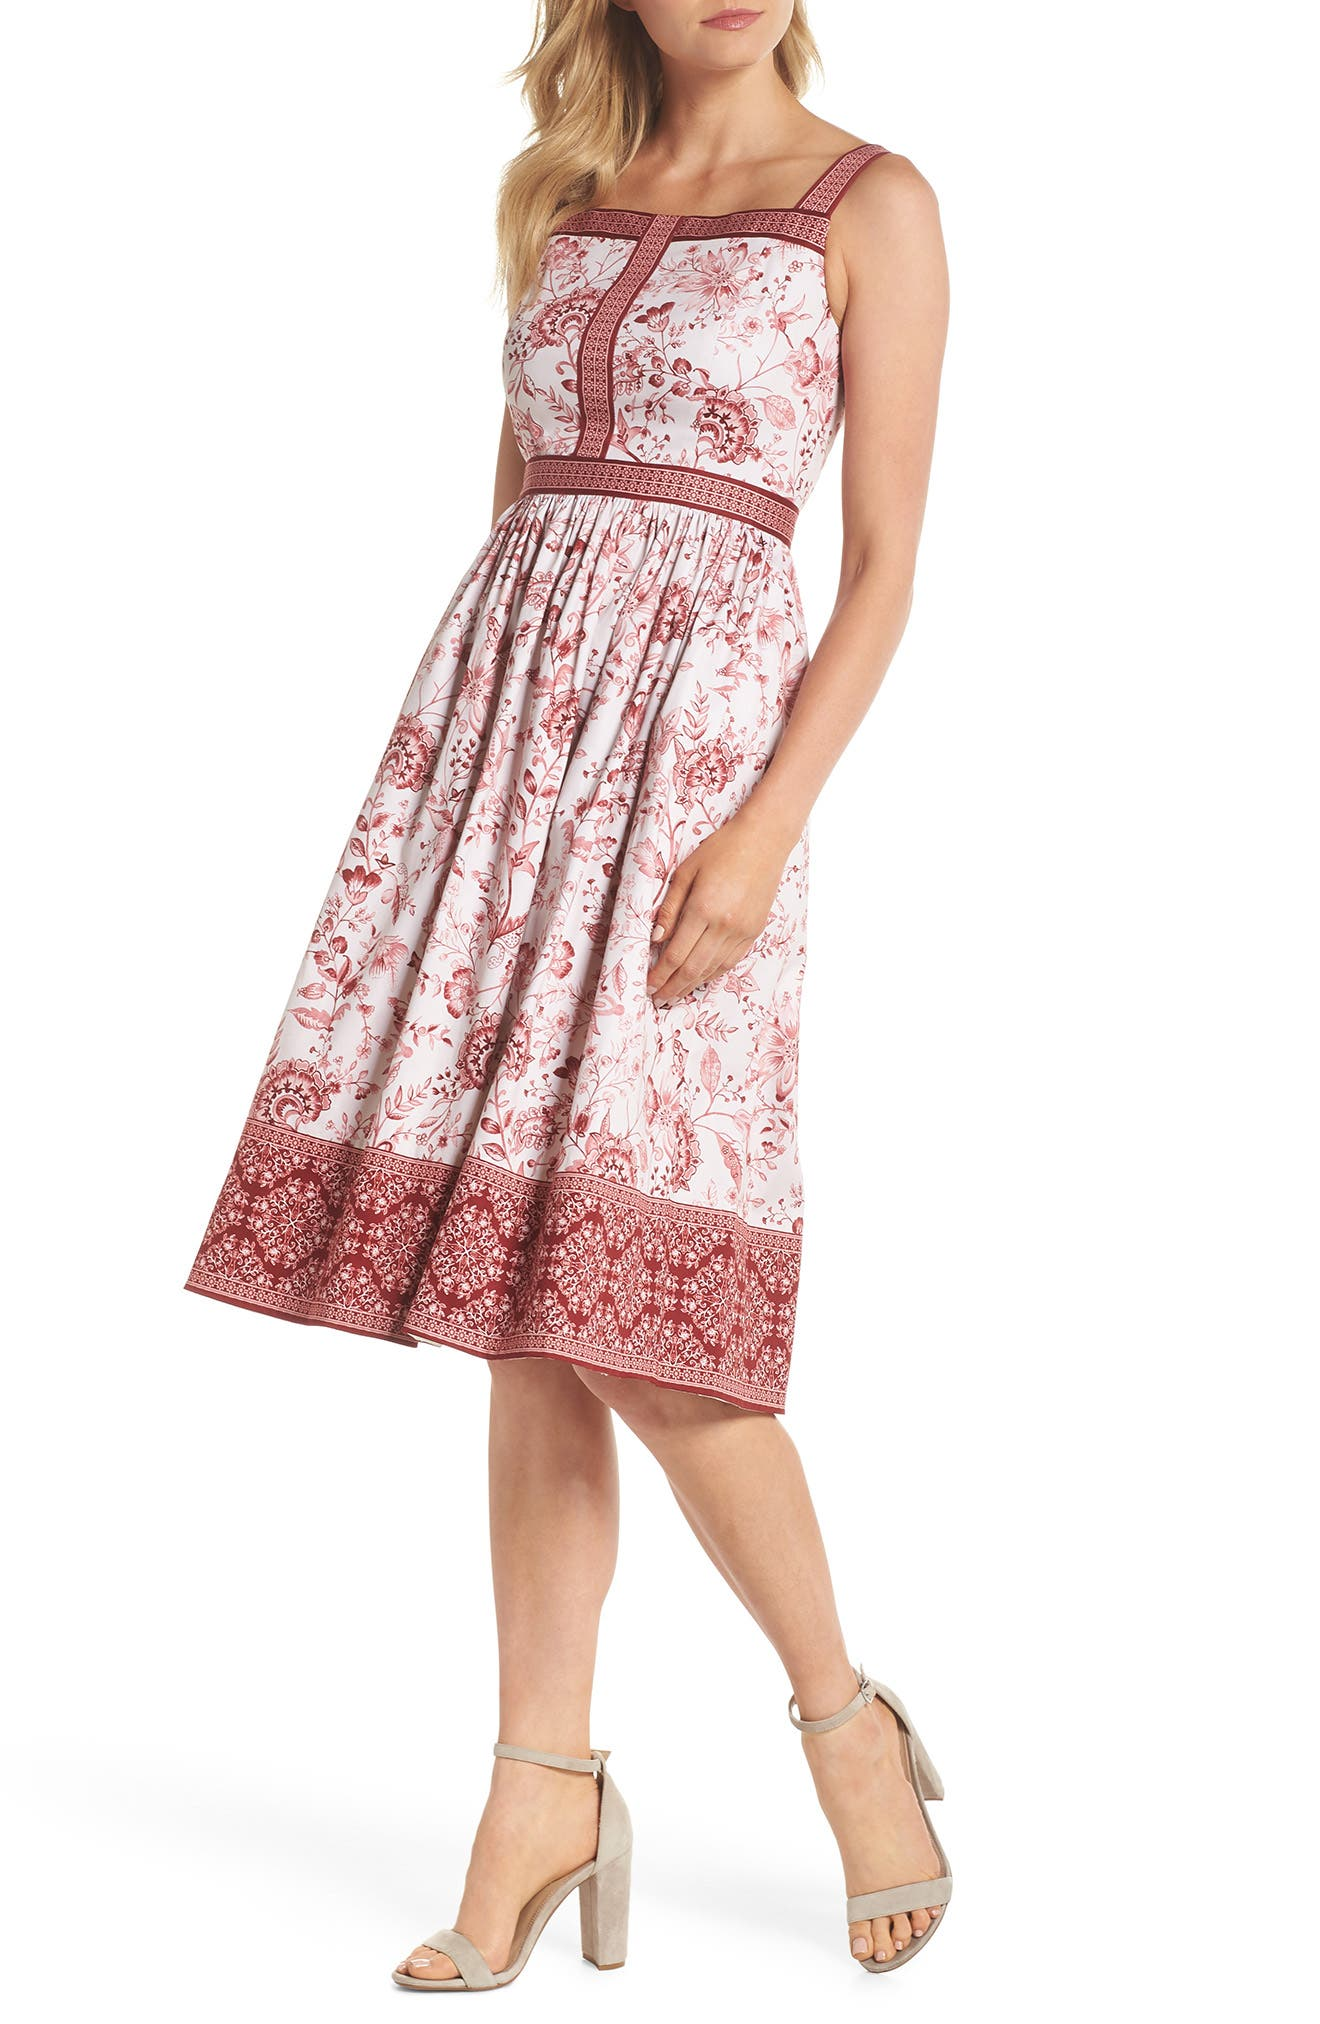 Esme Floral Fit & Flare Dress,                             Main thumbnail 1, color,                             CHAMPAGNE/ BURGUNDY